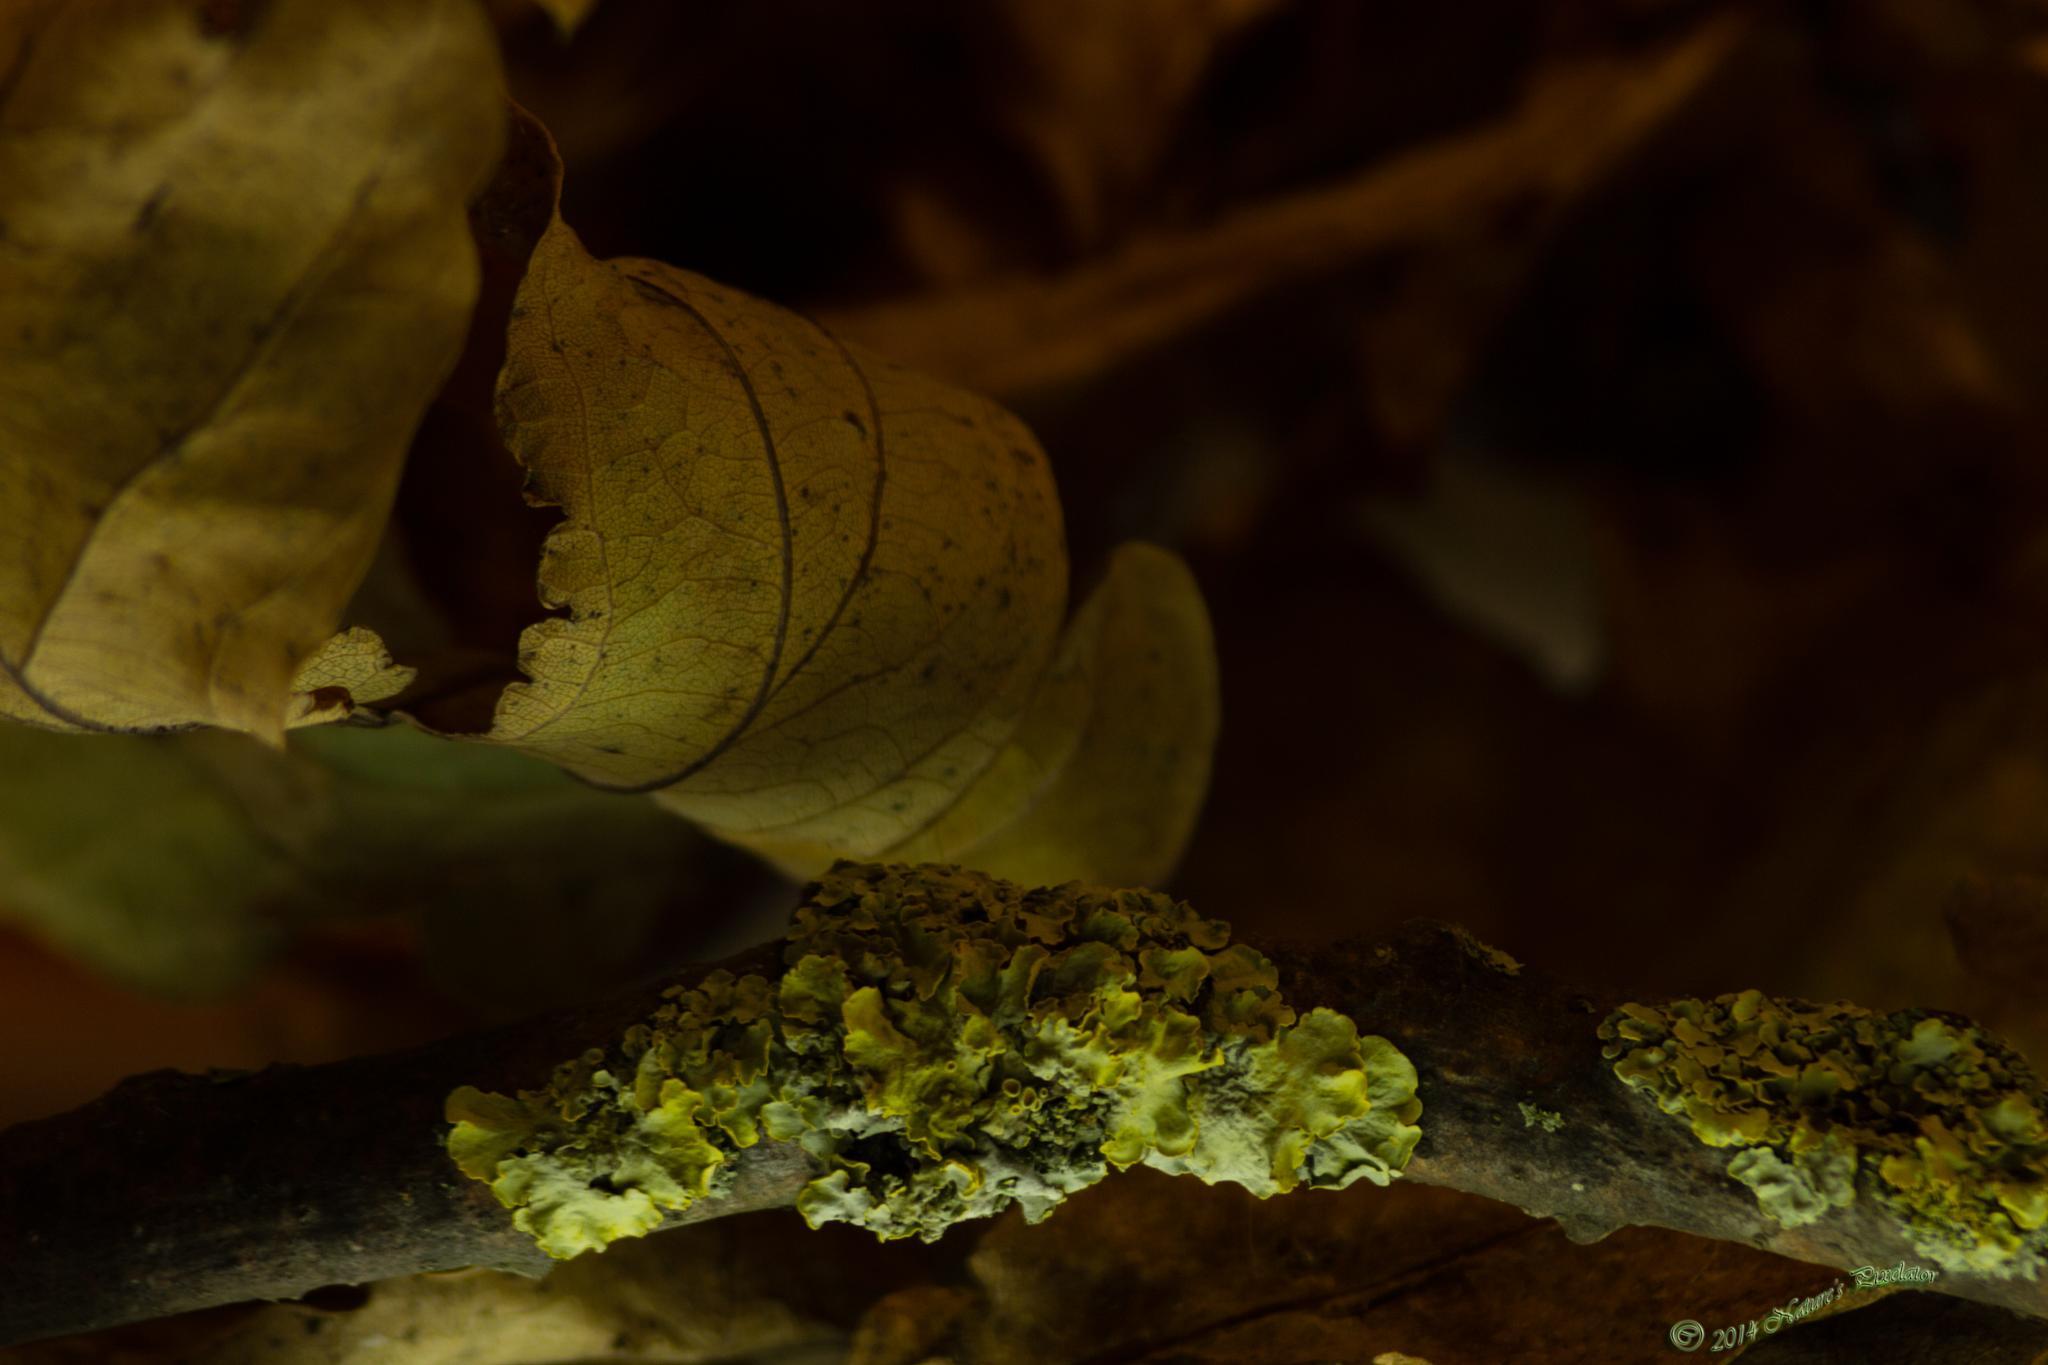 Lichens & Oak Leaves by Nature's Pixelator